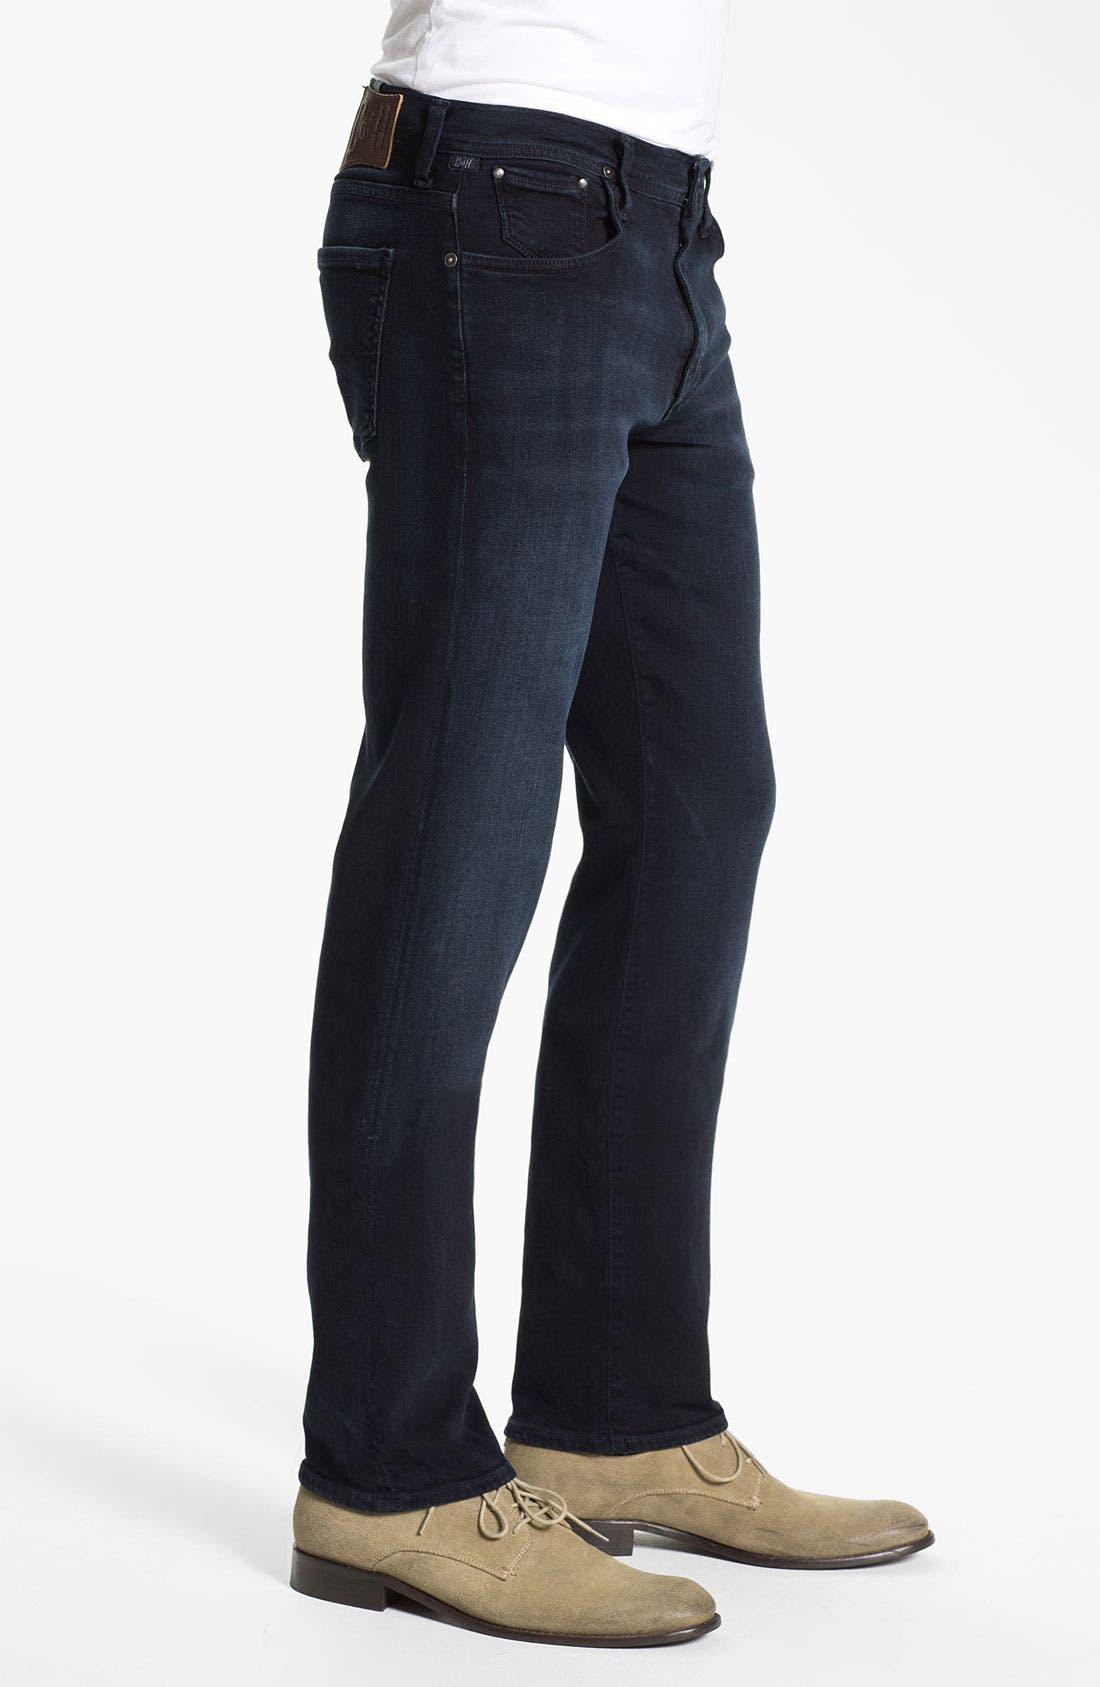 Alternate Image 3  - Citizens of Humanity 'Adonis' Comfort Slim Fit Jeans (Walker Blue)